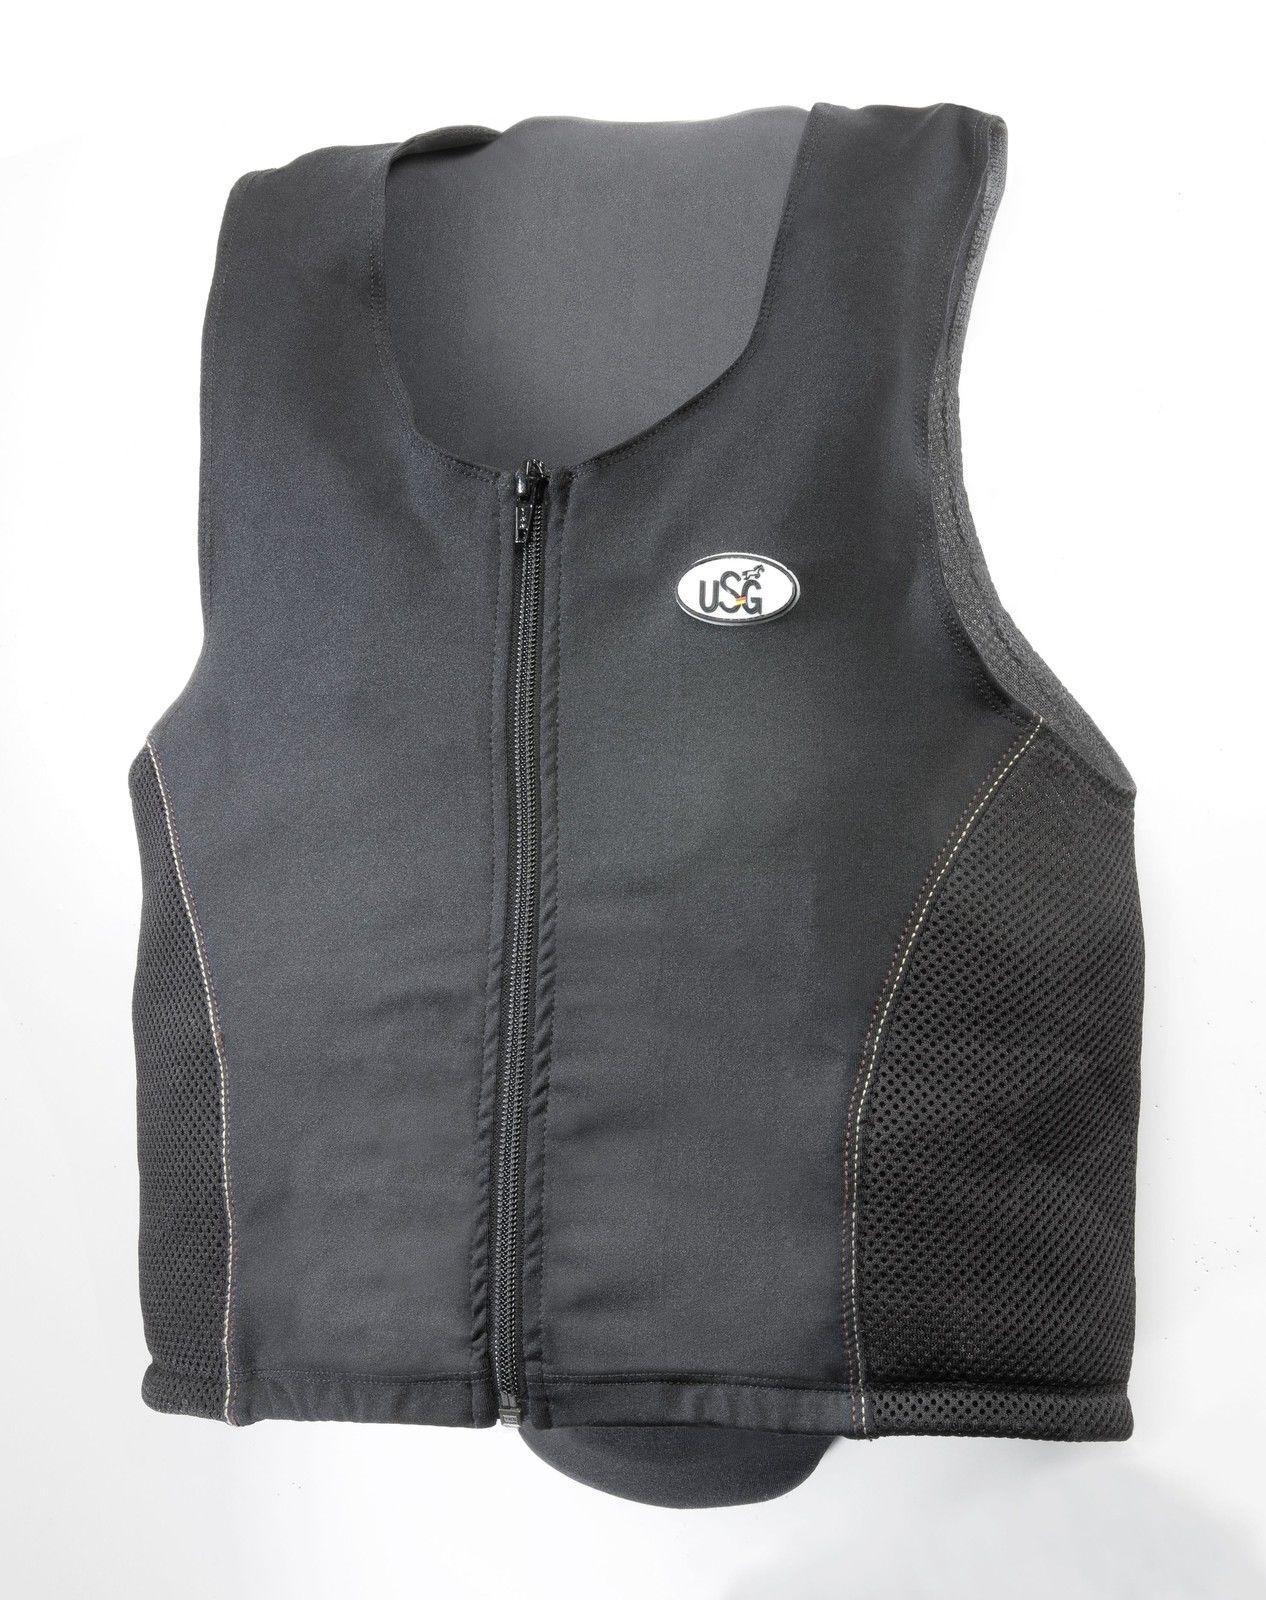 Rückenschutz USG Precto 3000 Neu Rückenprotektor leicht und bequem bequem bequem f5bbd4